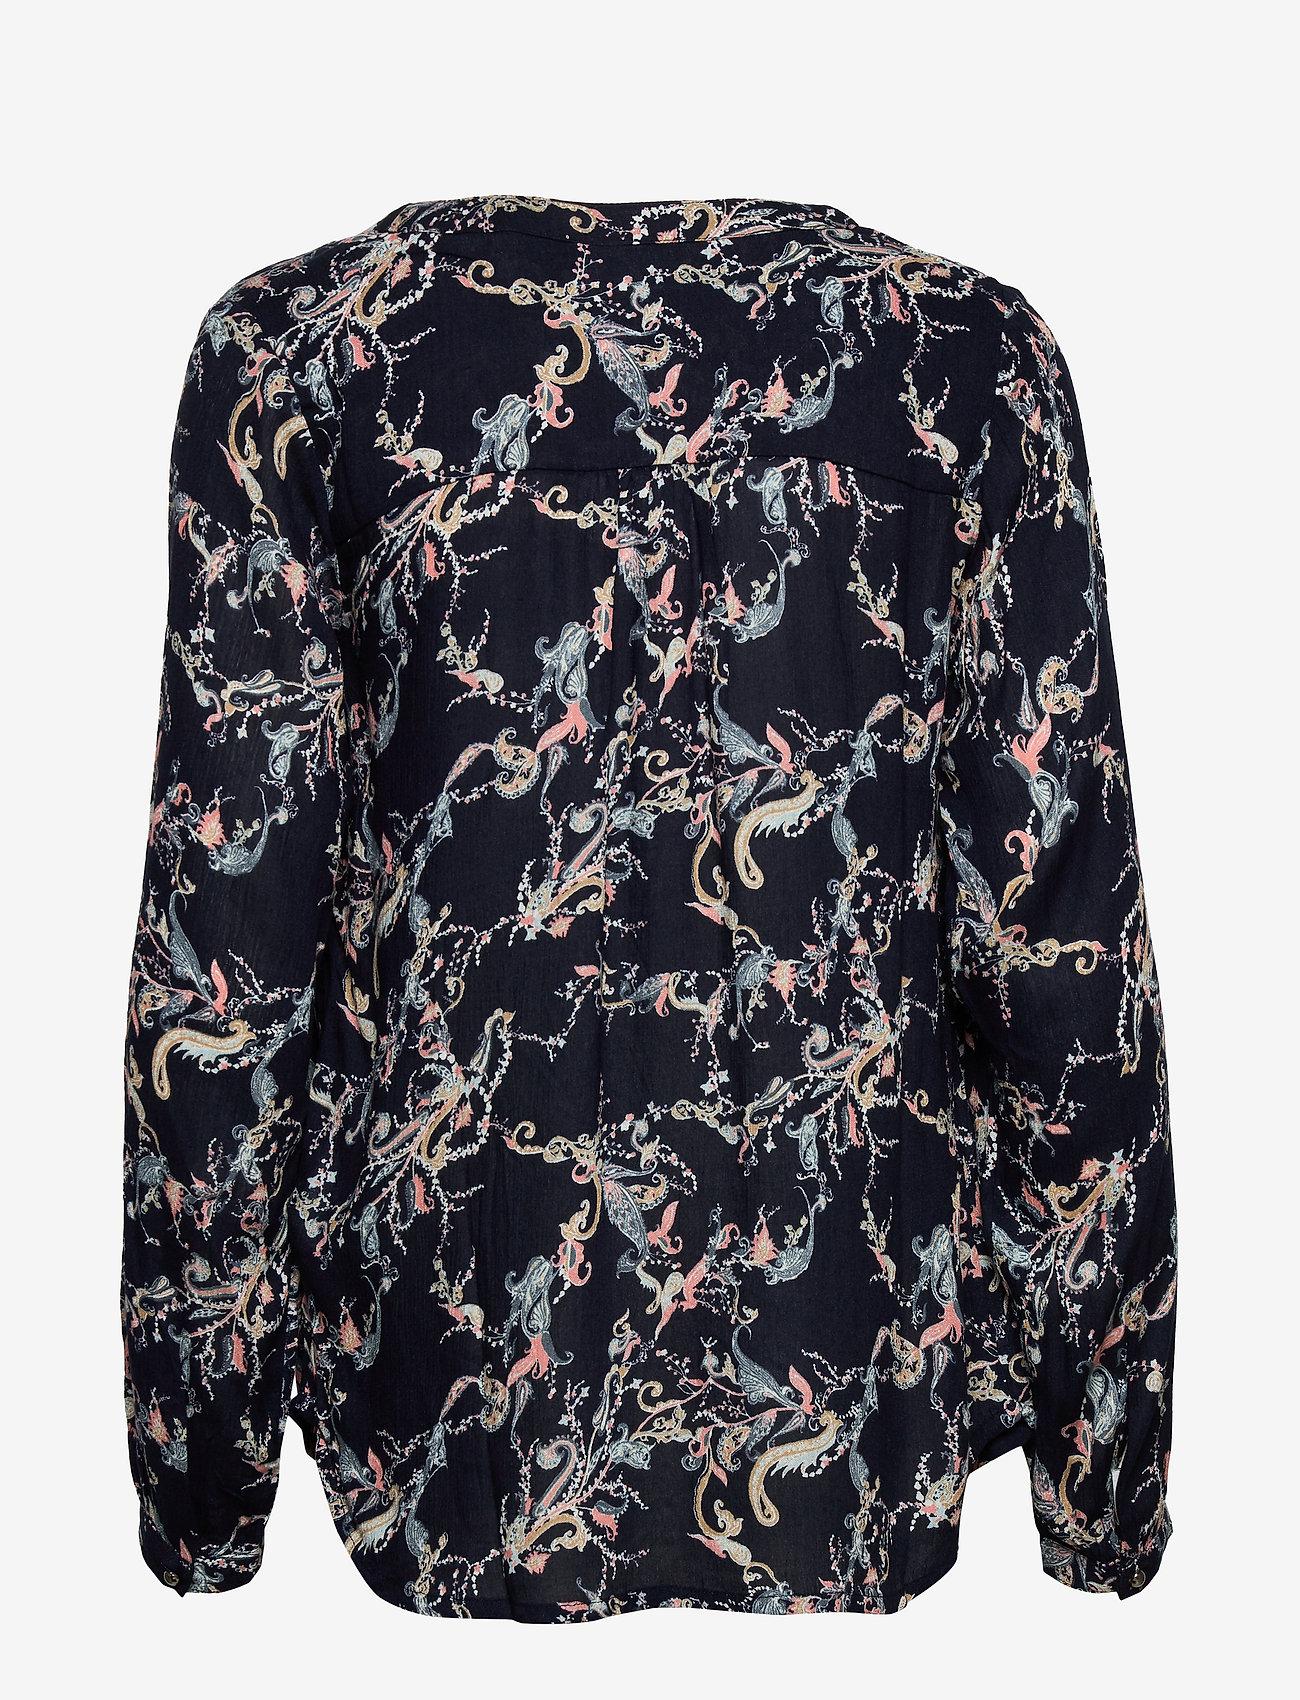 Kaffe KAeverlyn Amber Blouse - Bluzki & Koszule MIDNIGHT MARINE - Kobiety Odzież.